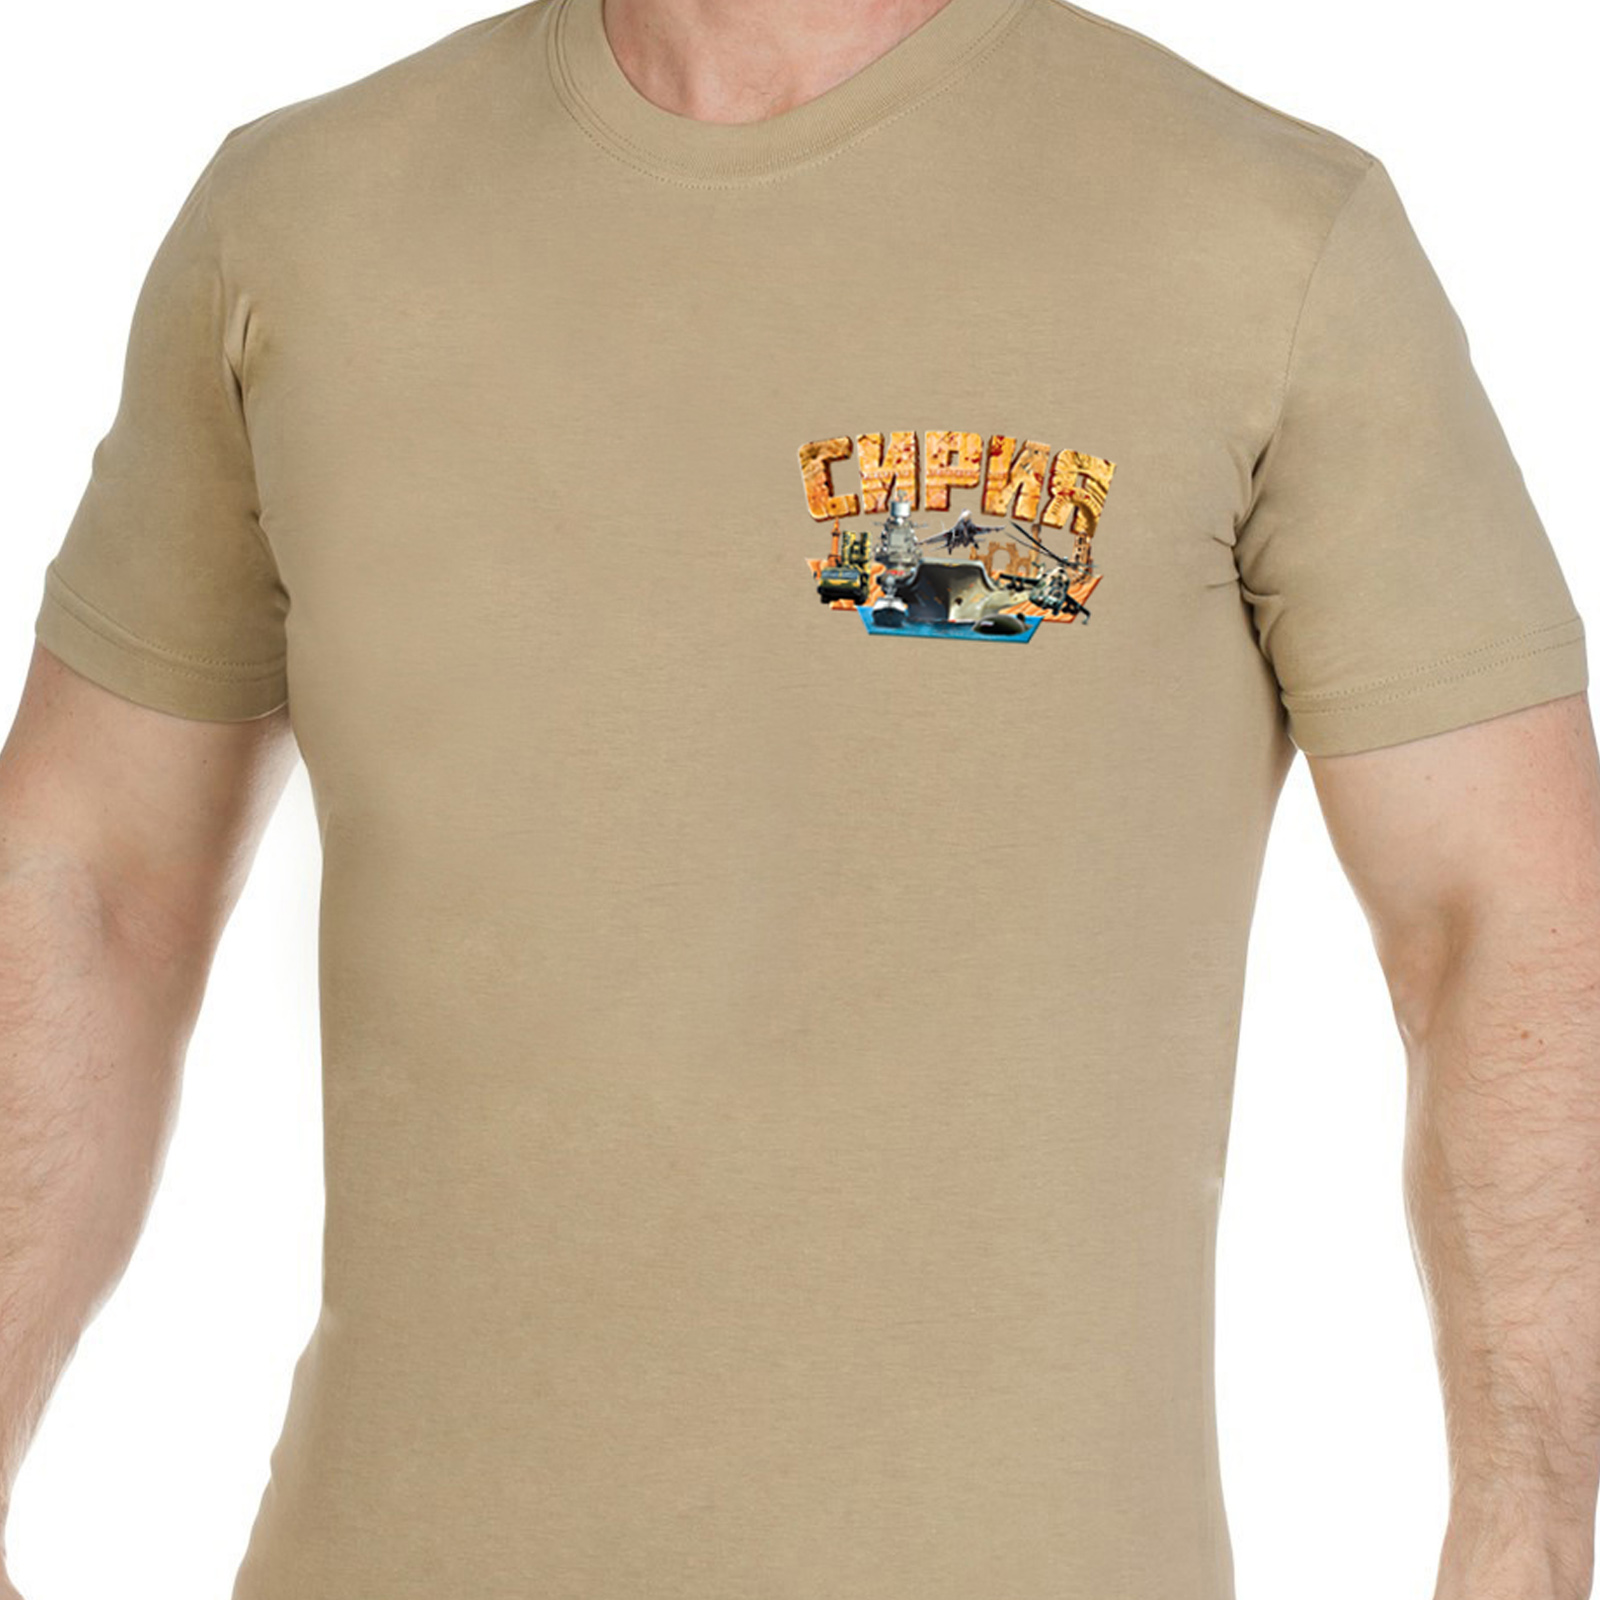 Надежная песочная футболка СИРИЯ